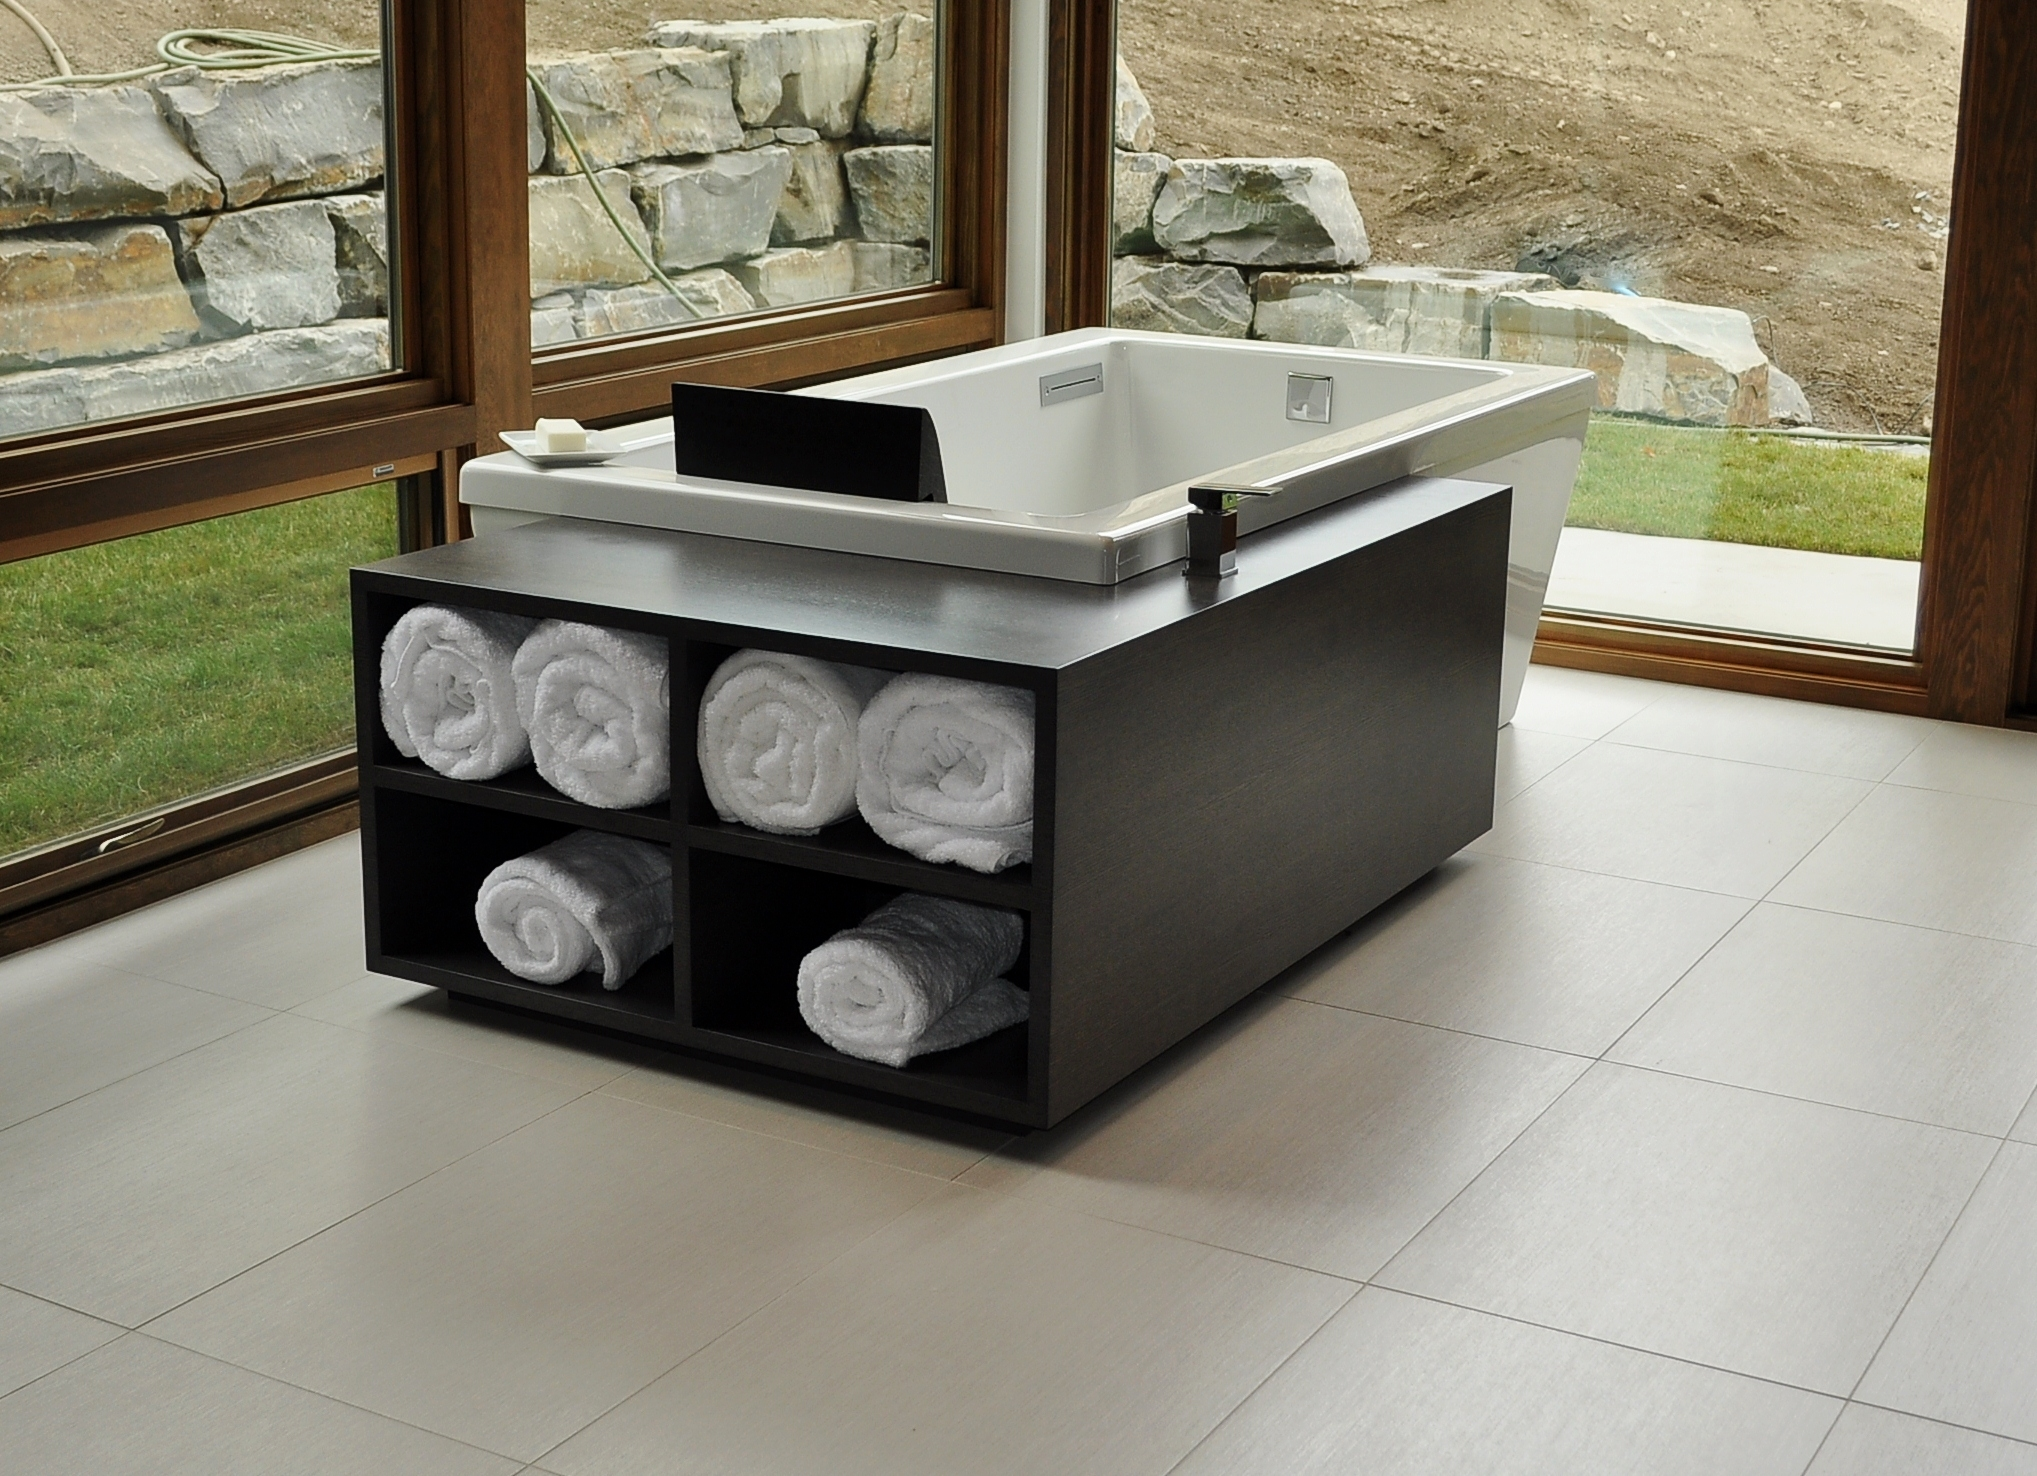 stained-white-oak-custom-wood-tub-surround-open-storage.jpg.JPG